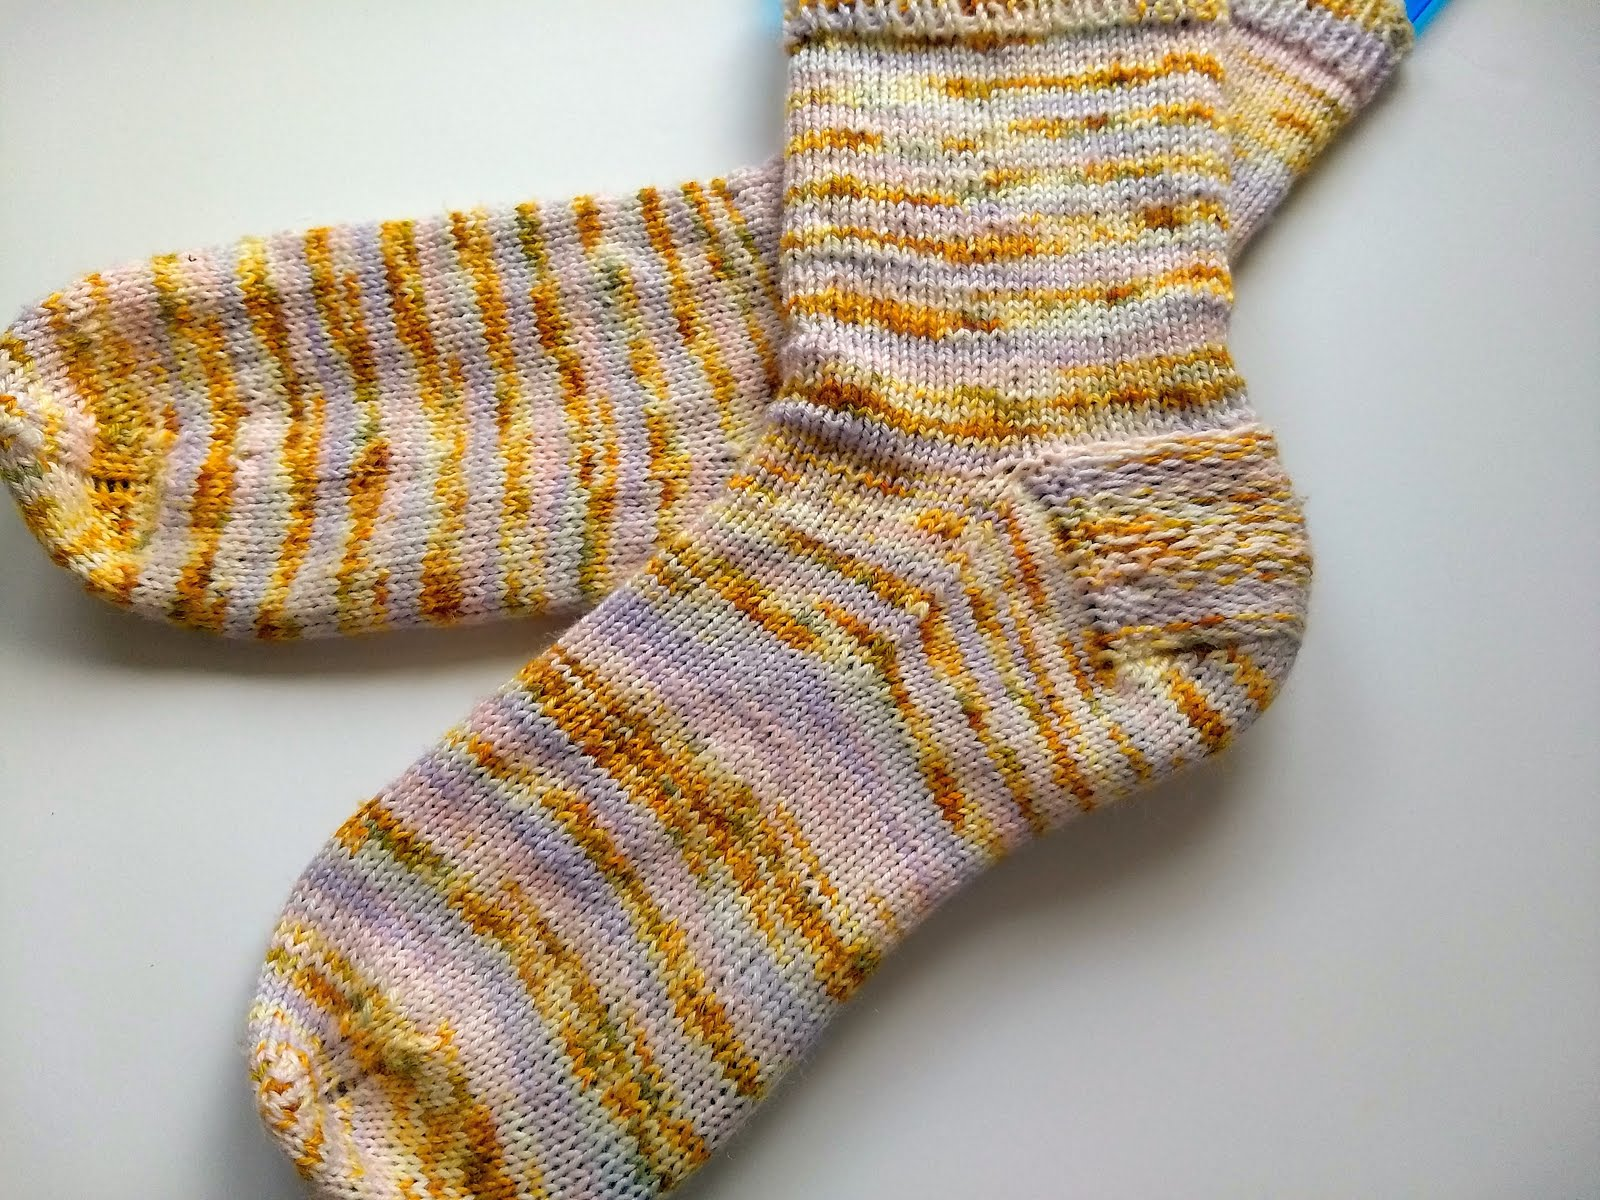 Cuff down socks for a beginner knitter